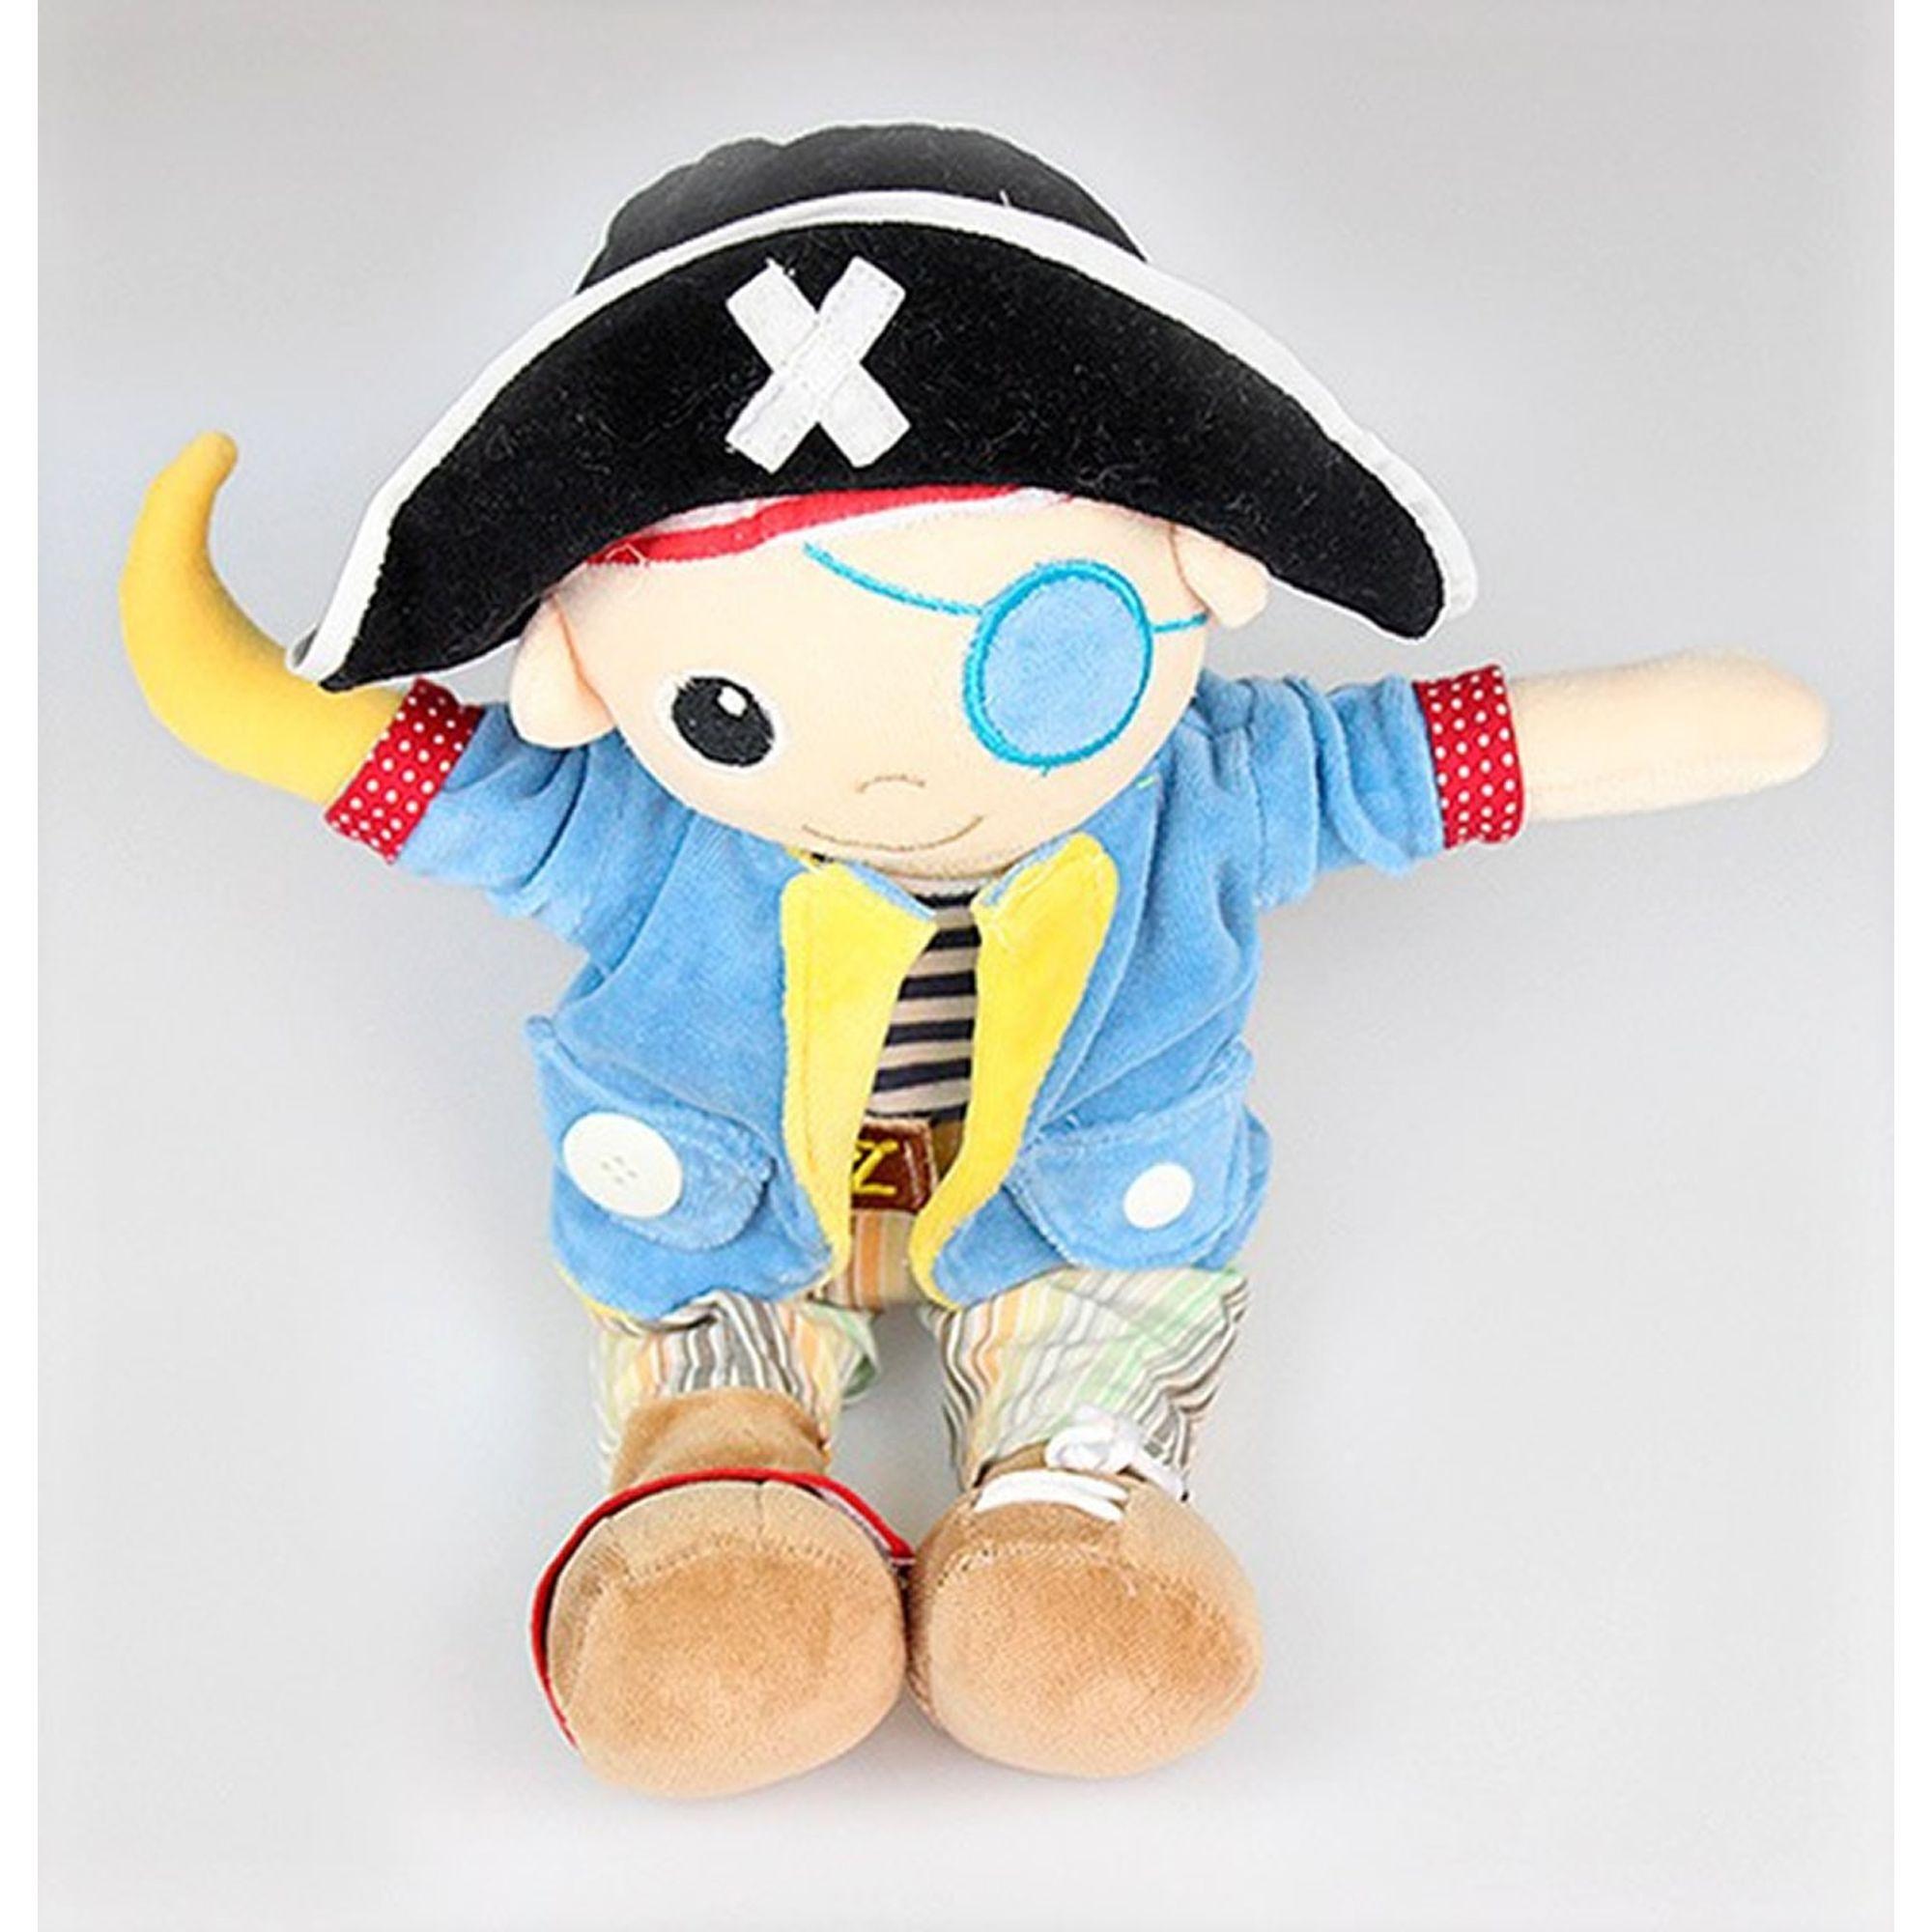 boneco-pirata-plush-e-pano-colorido-zip-toys